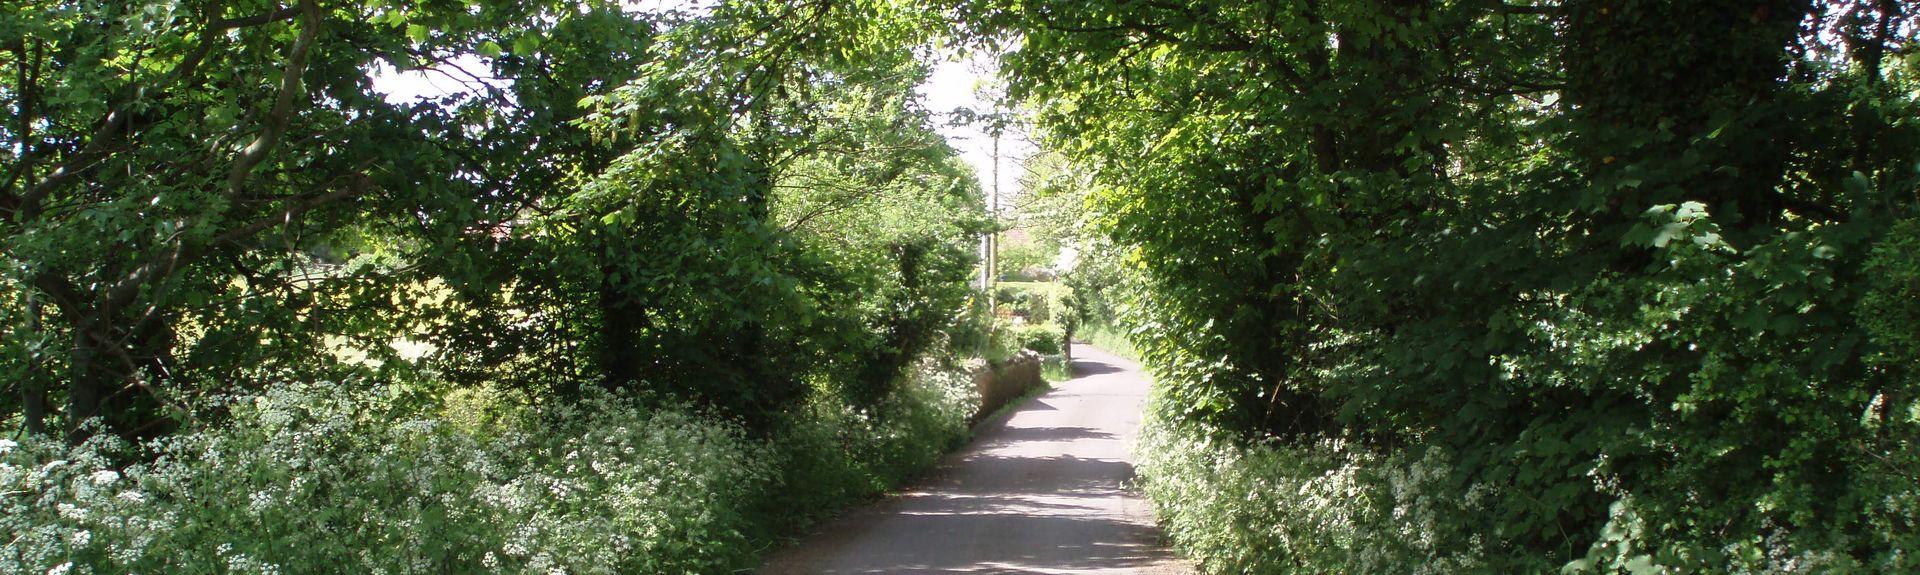 Keynsham, Bristol, Bath and North East Somerset, UK